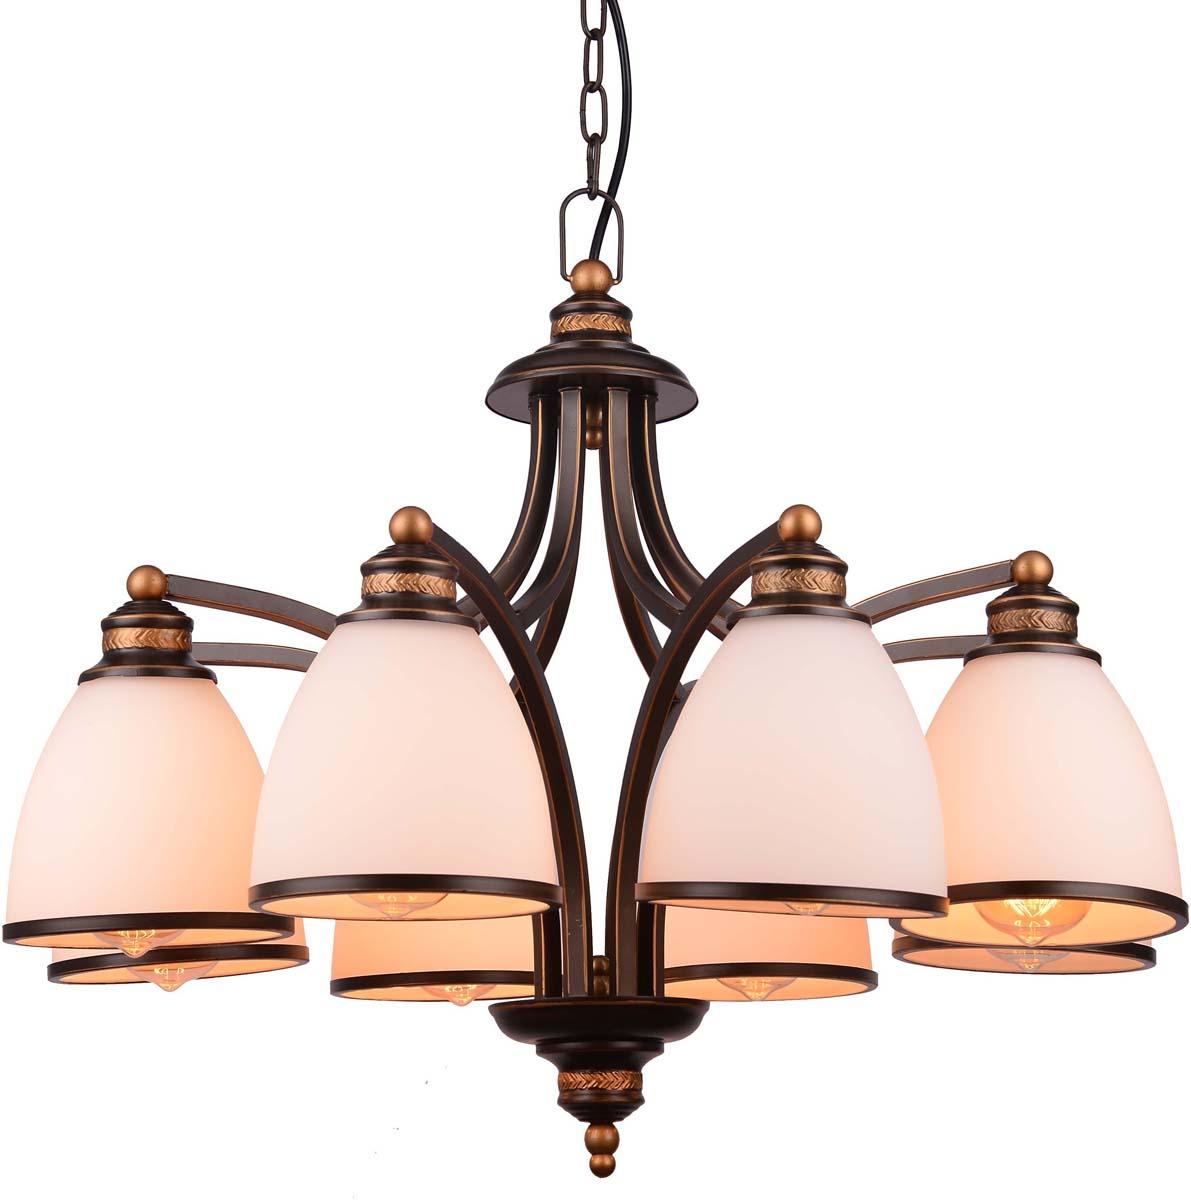 Светильник подвесной Arte Lamp Bonito, 8 х E27, 40 W. A9518LM-8BA люстра на штанге arte lamp liverpool a3004pl 8ba